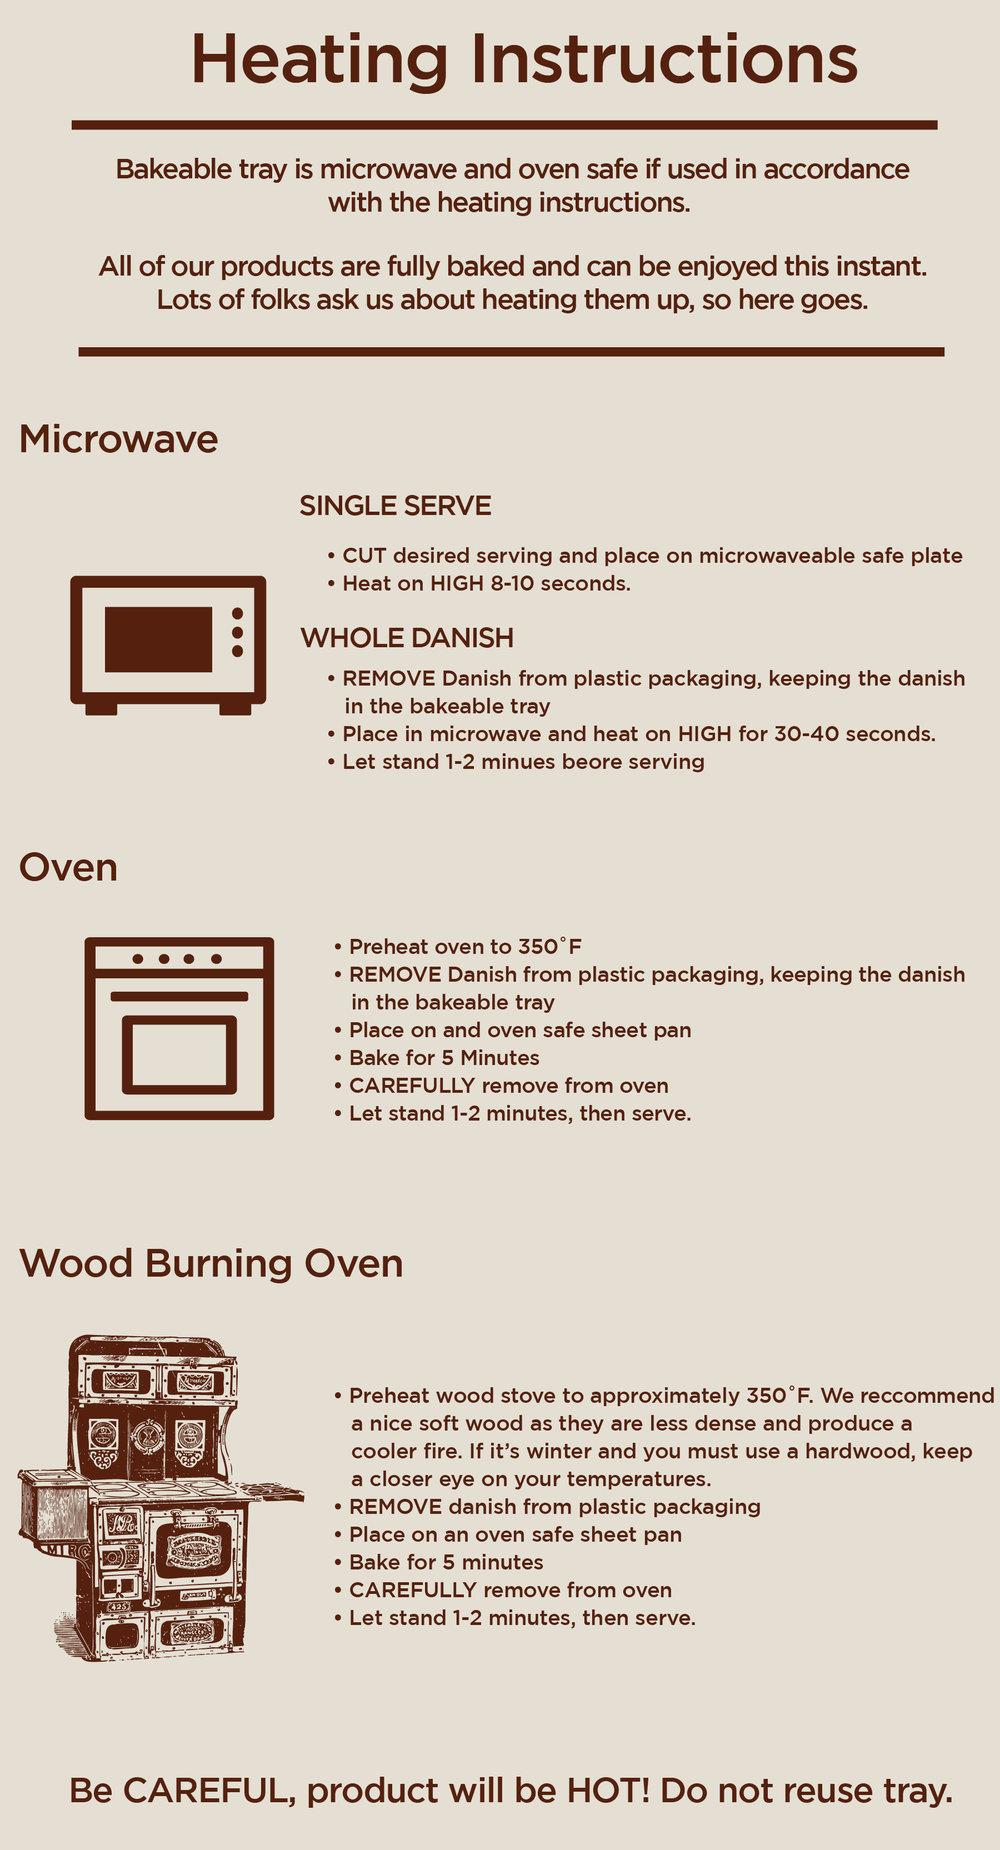 Heating Instructions 3-01.jpg